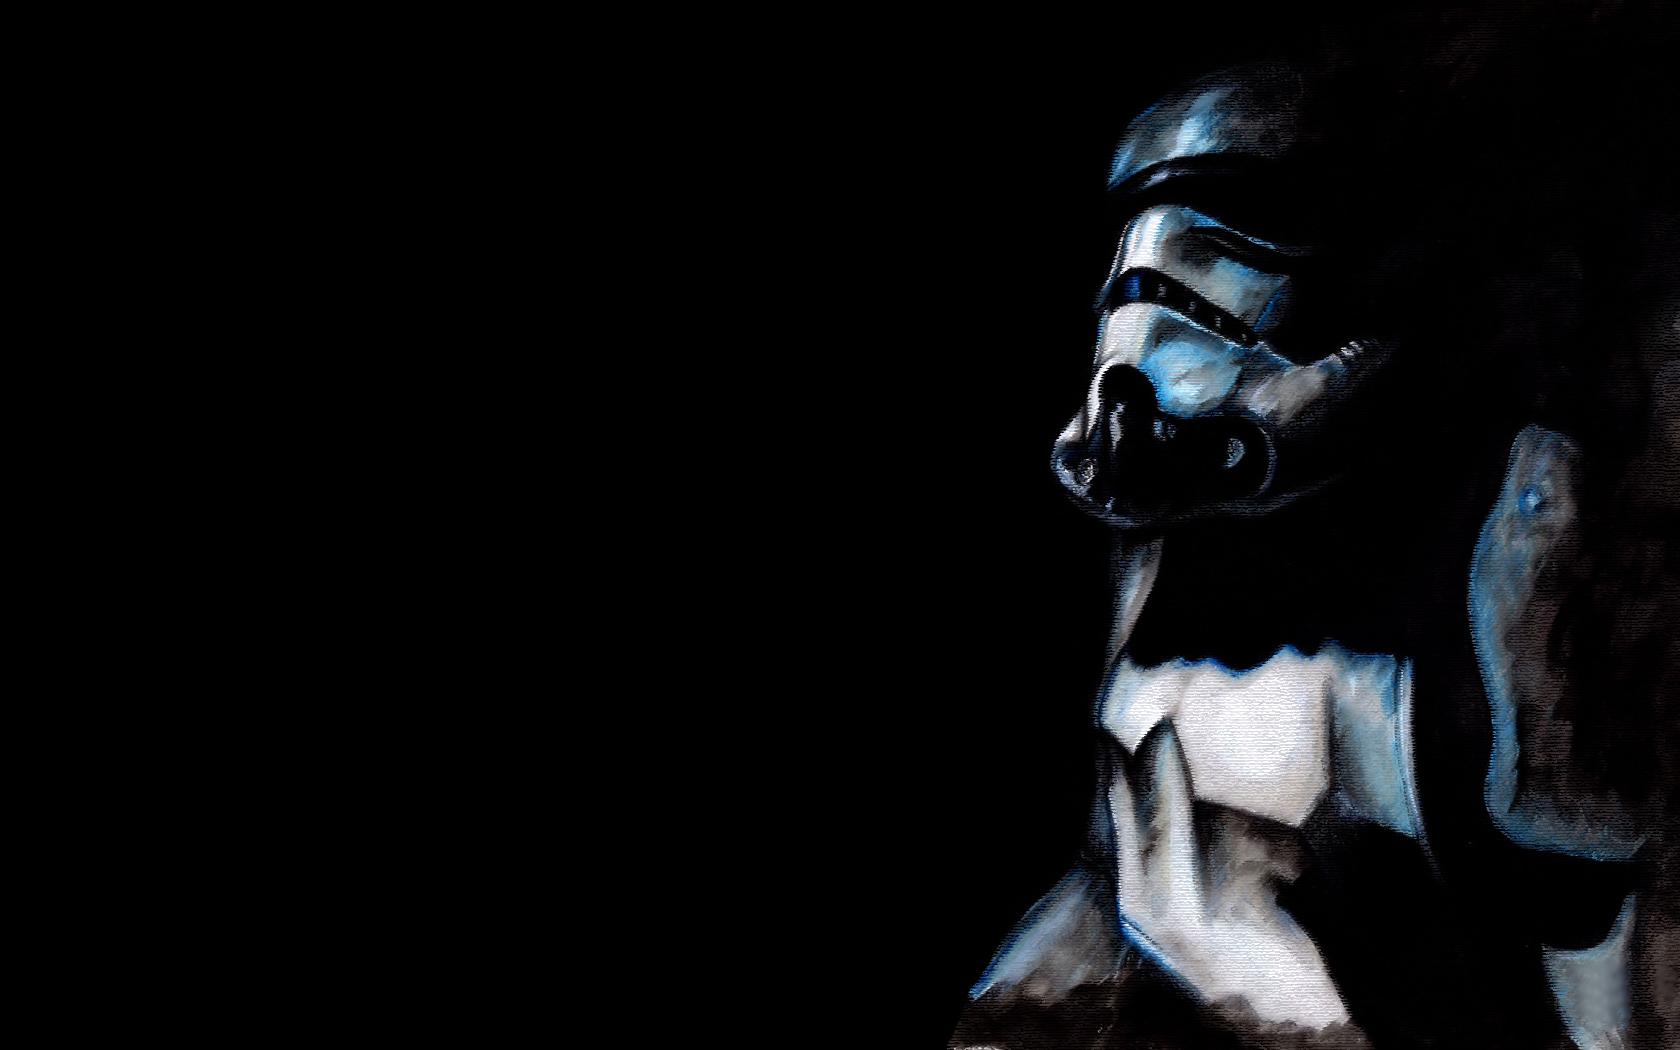 1680x1050px 1080p Star Wars Wallpapers Wallpapersafari